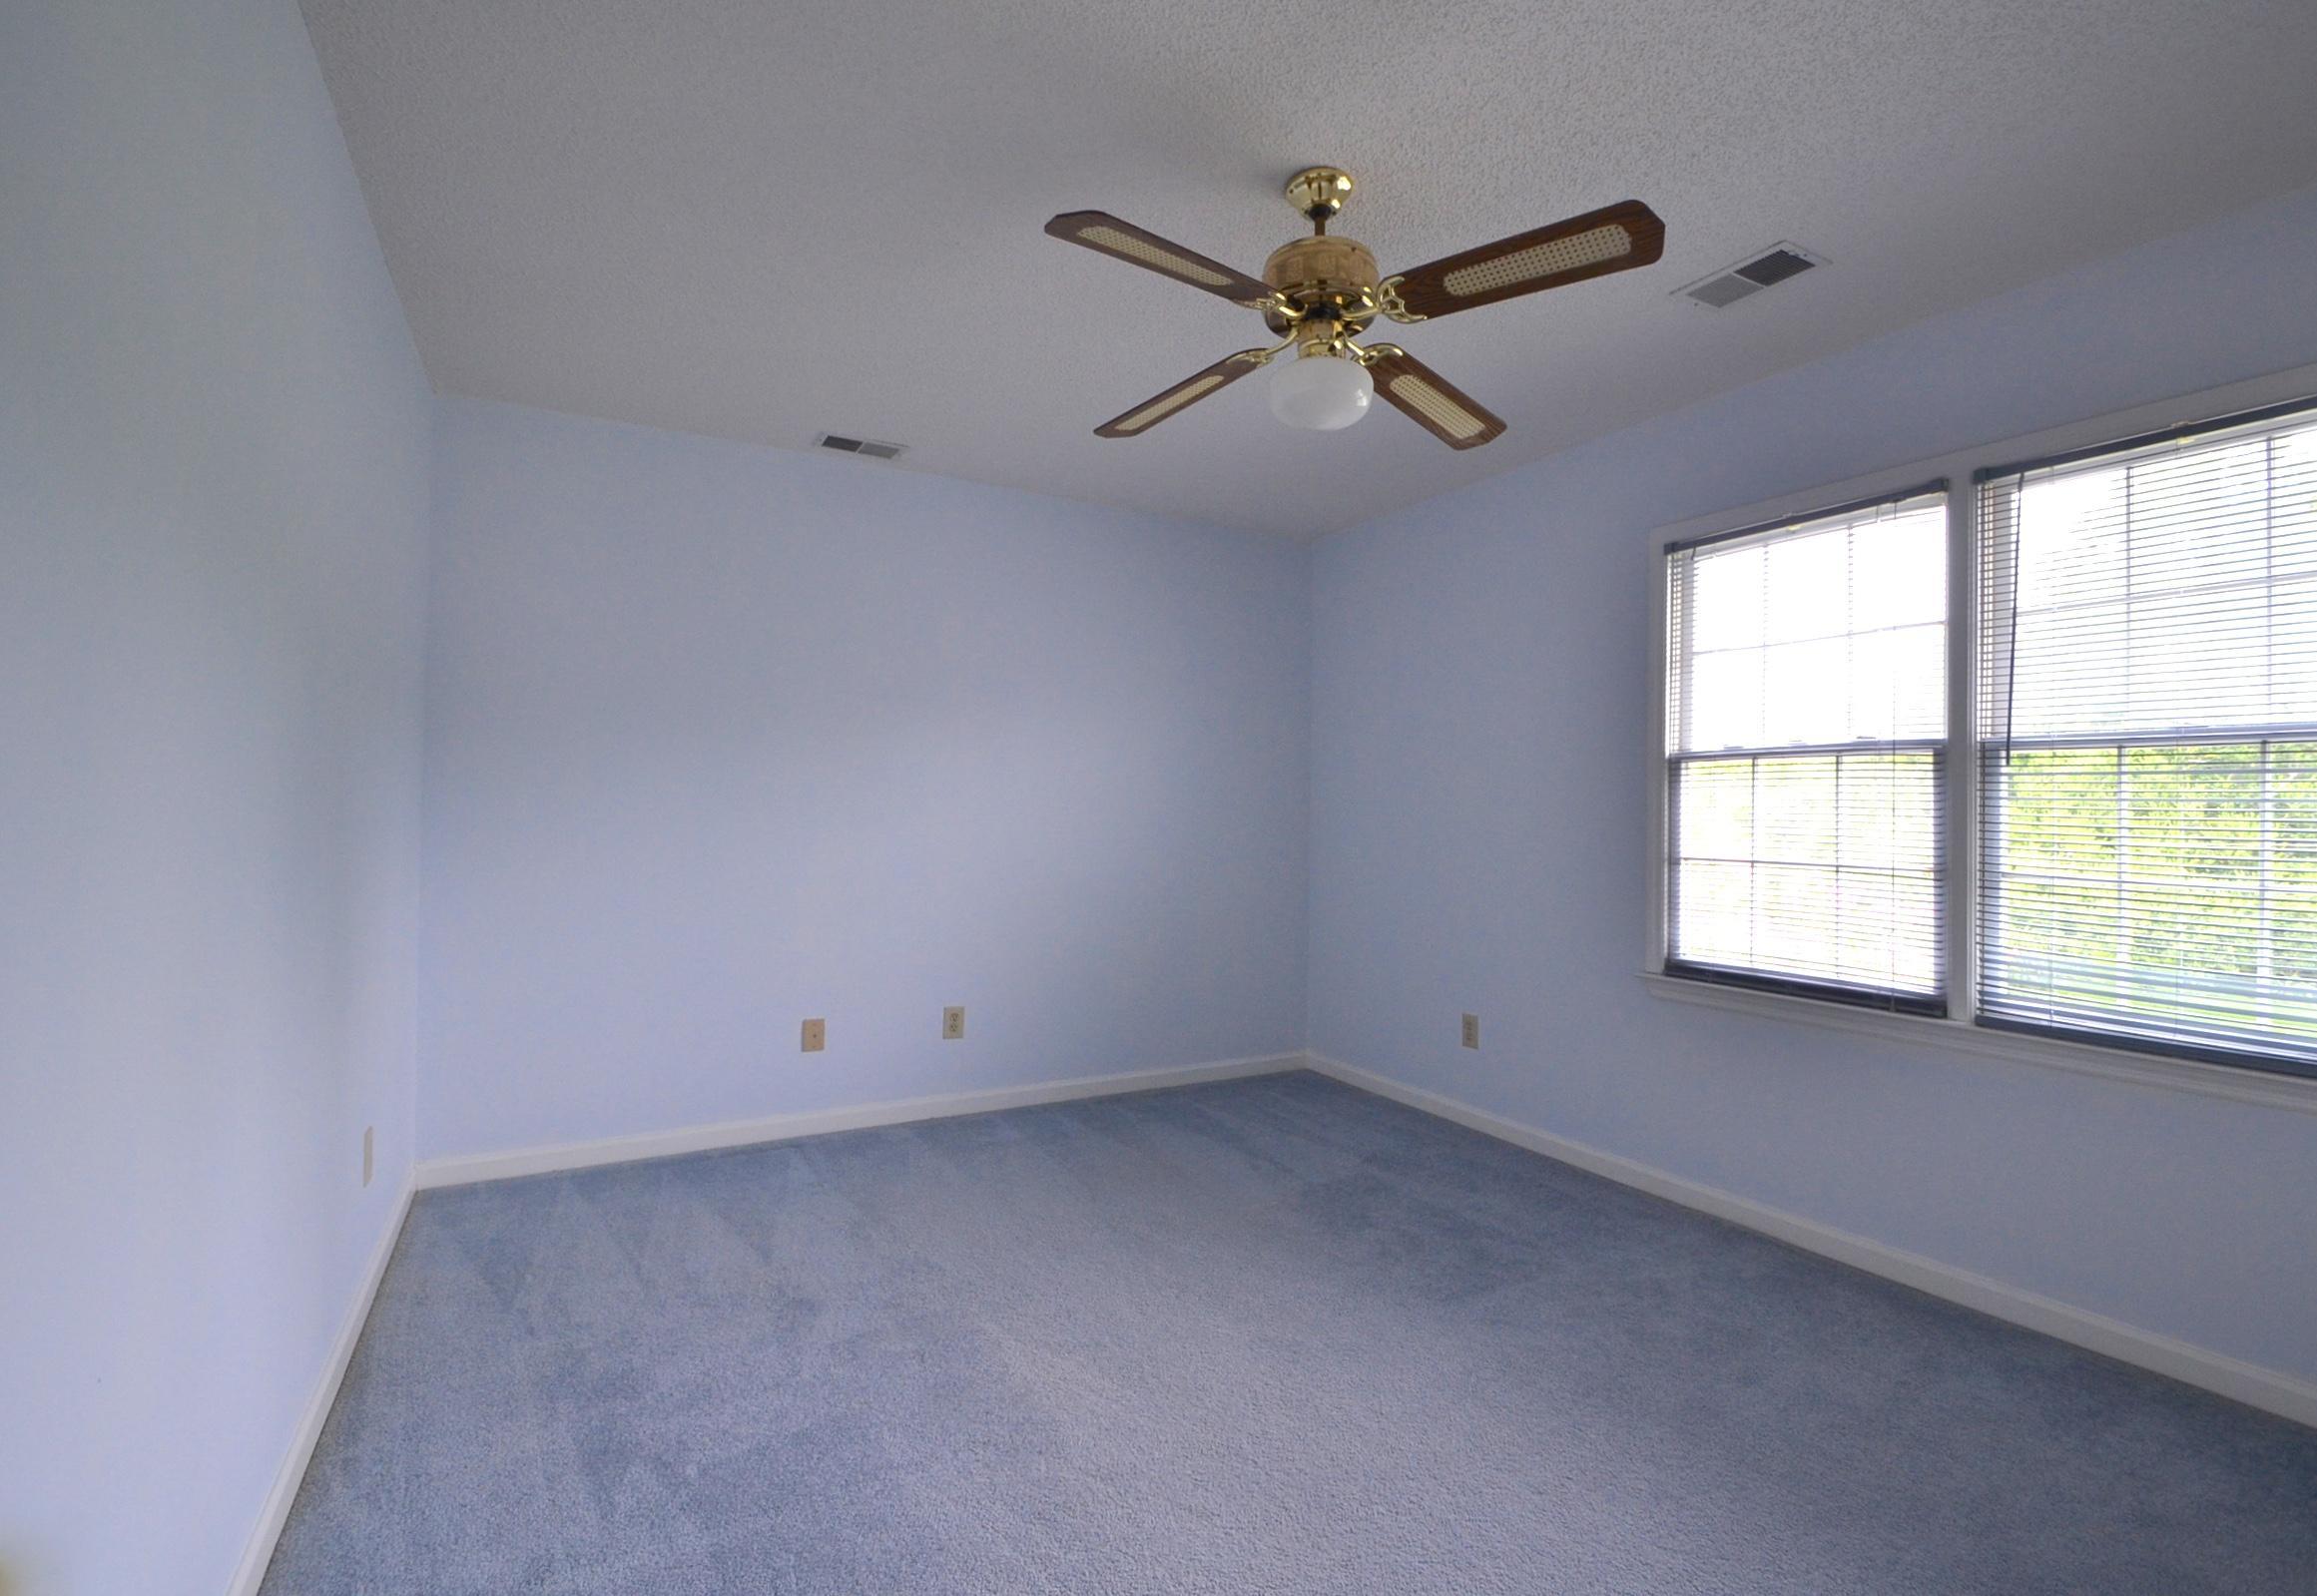 Photo of 1522 State Rd S-8-700, Moncks Corner, SC 29461